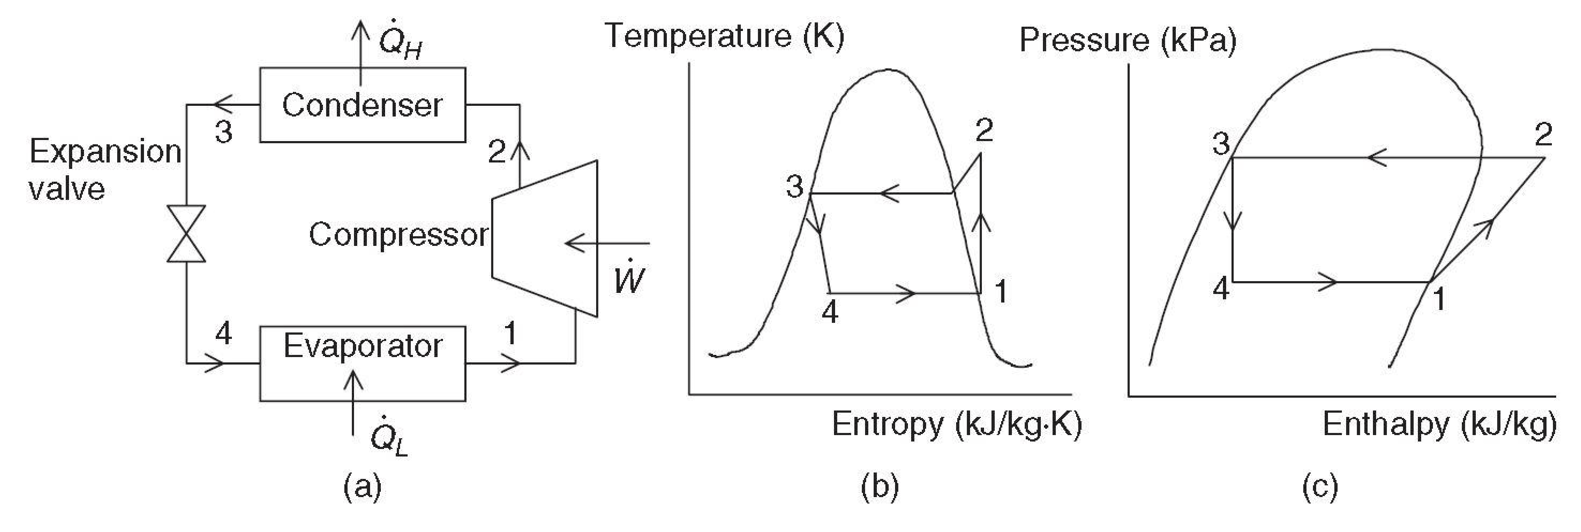 hight resolution of evaporator hvac diagram wiring diagrams schematics condenser coil drawing condenser coil diagram